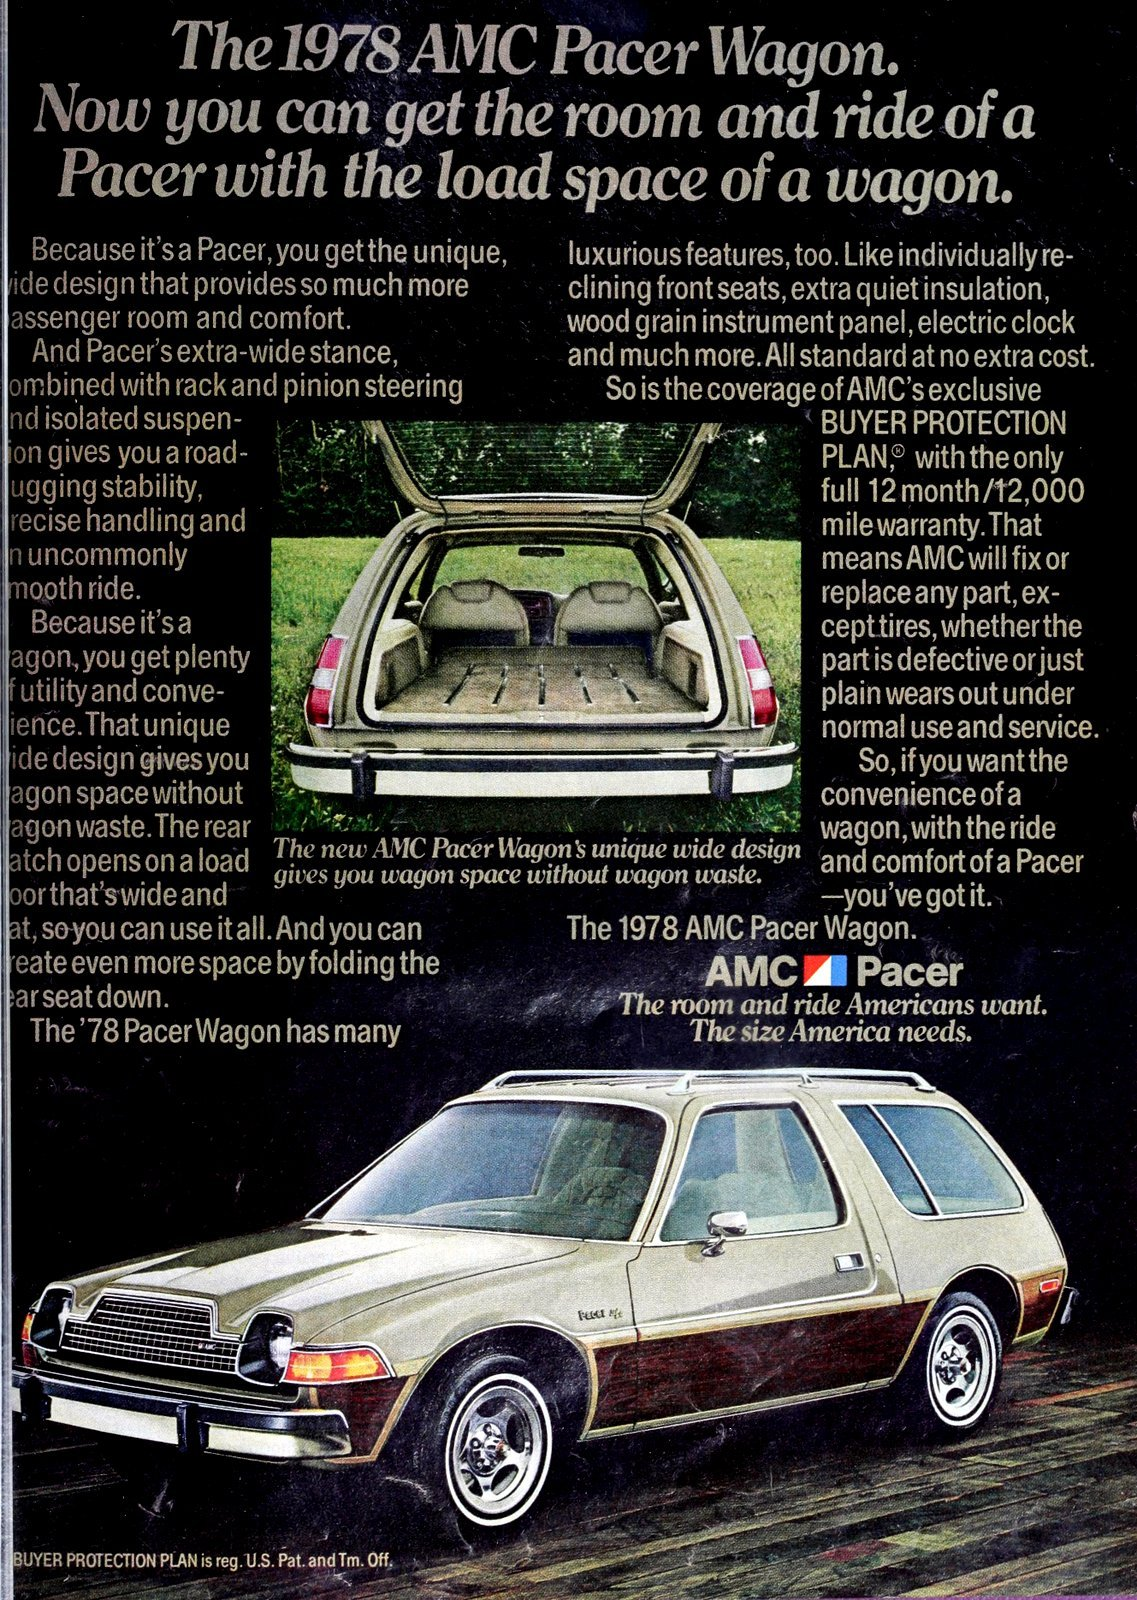 1978 American Motors Pacer Wagon